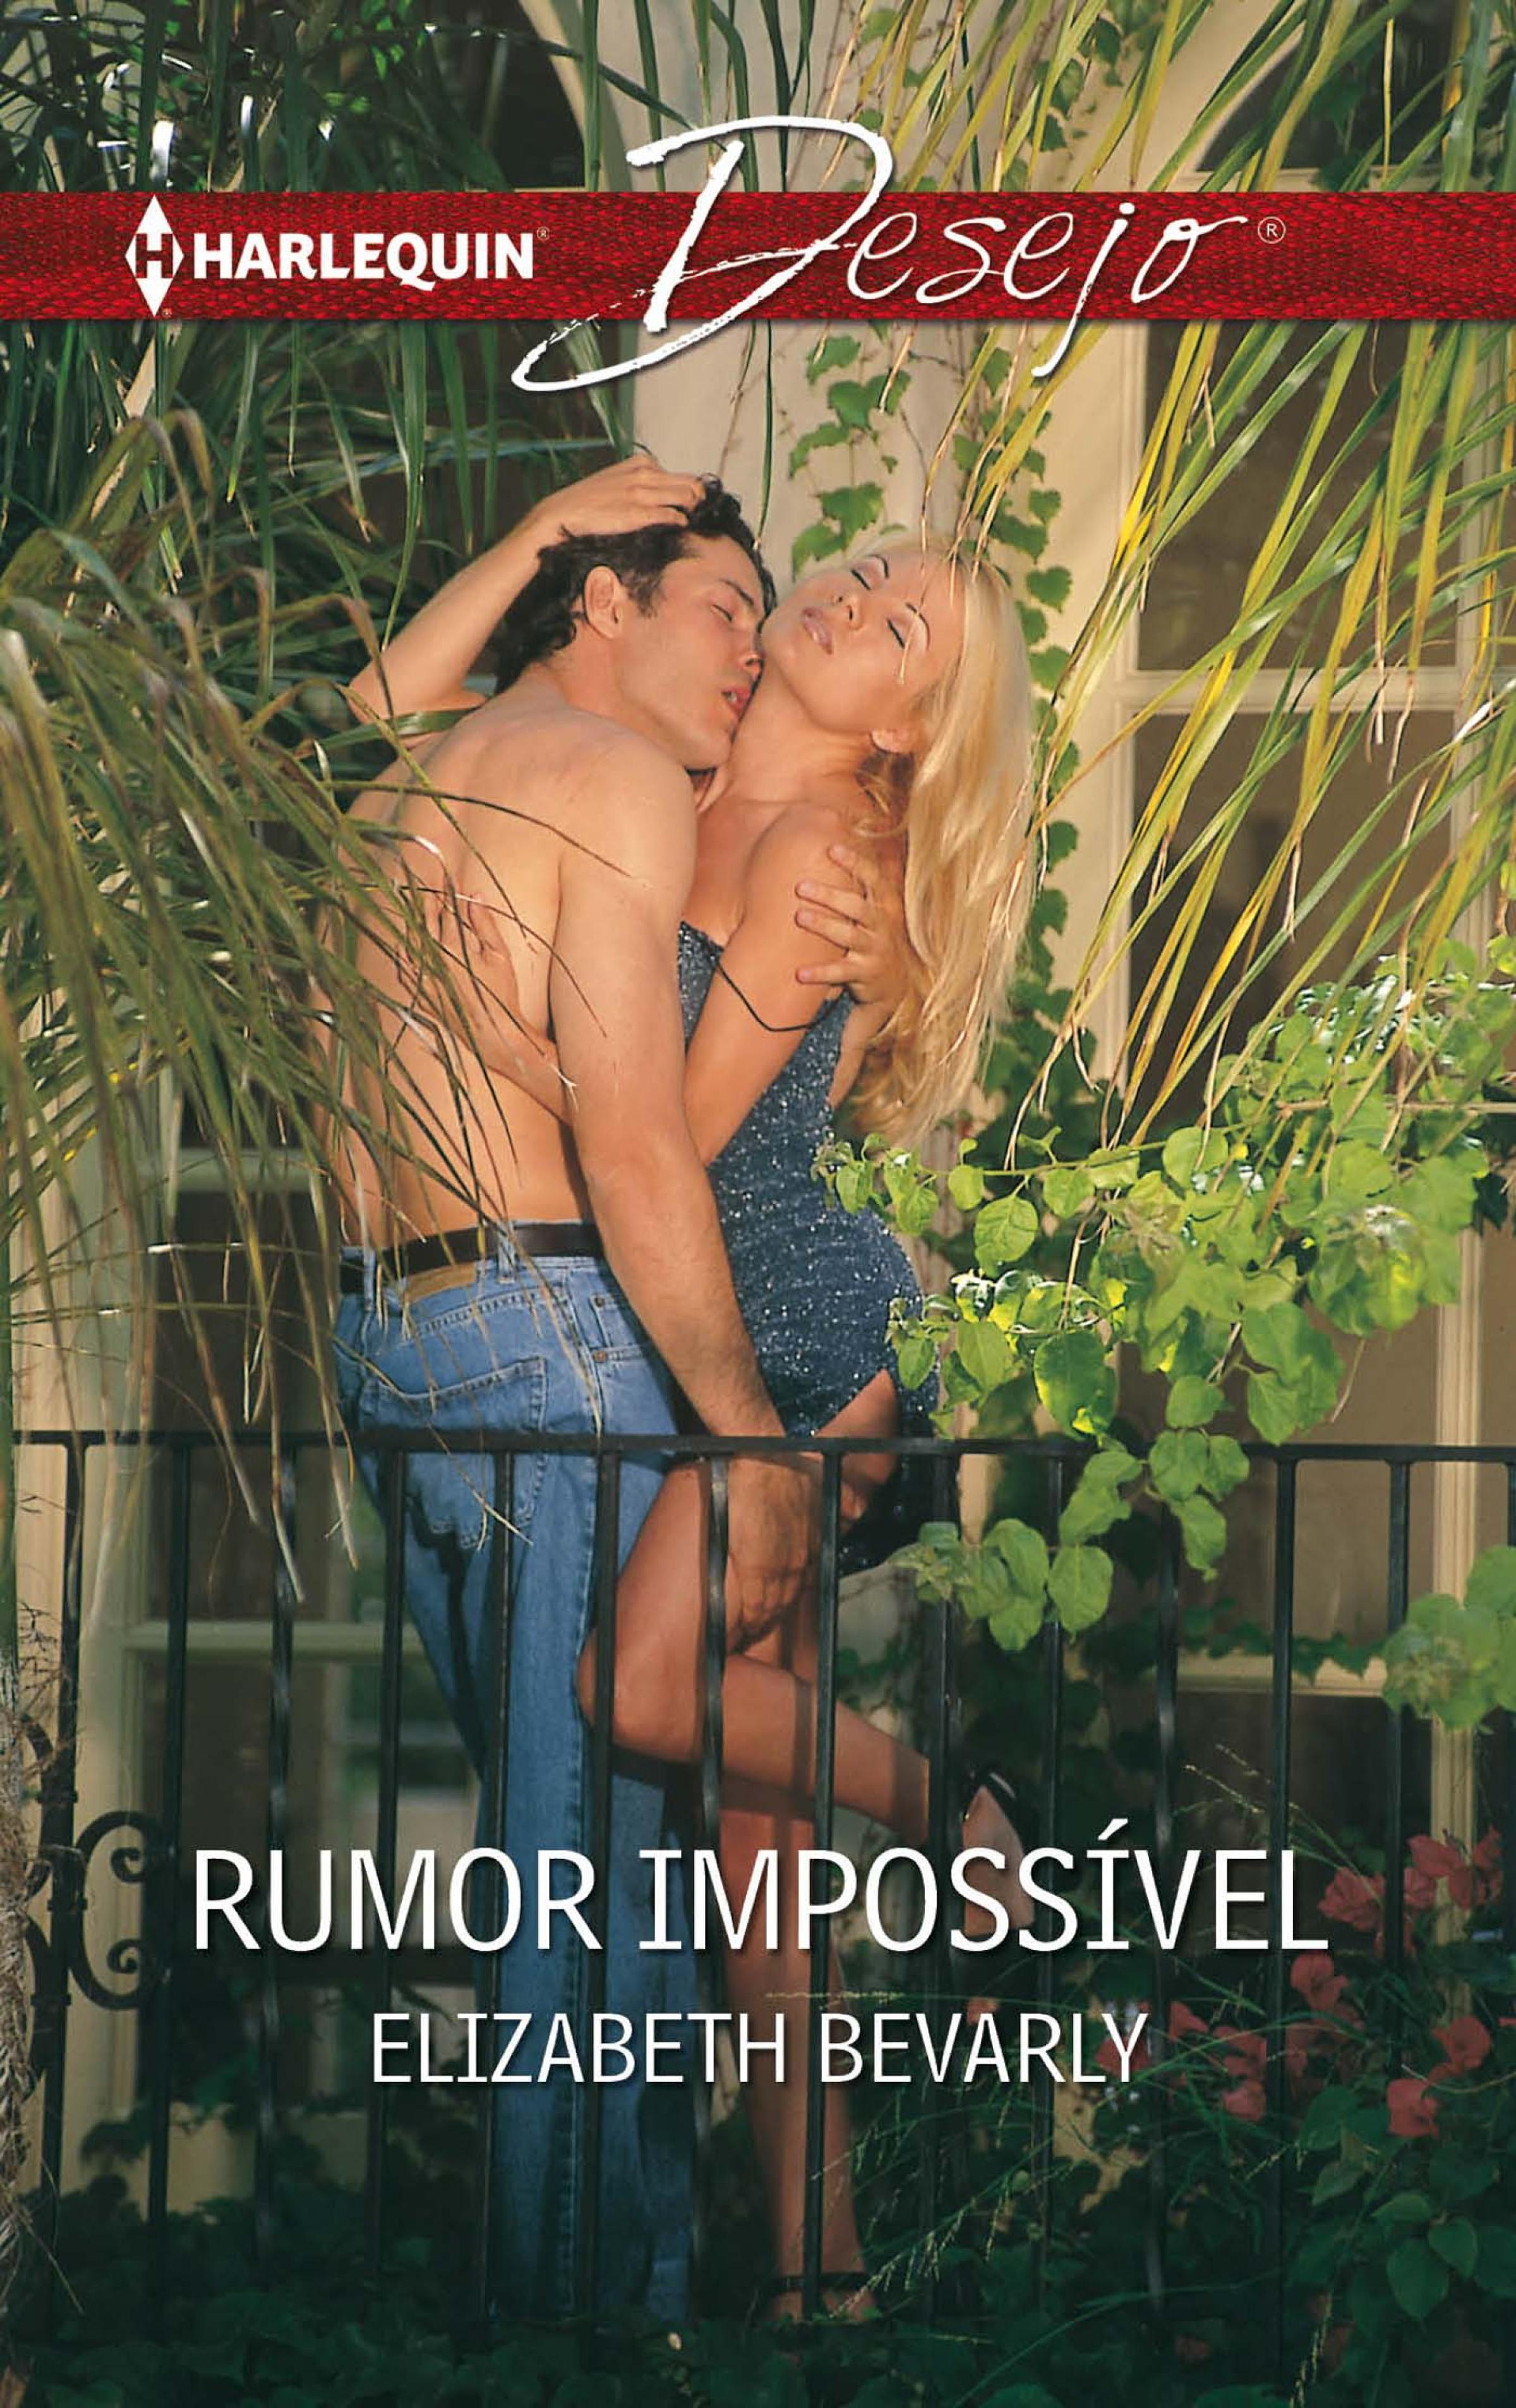 Elizabeth Bevarly Rumor impossível